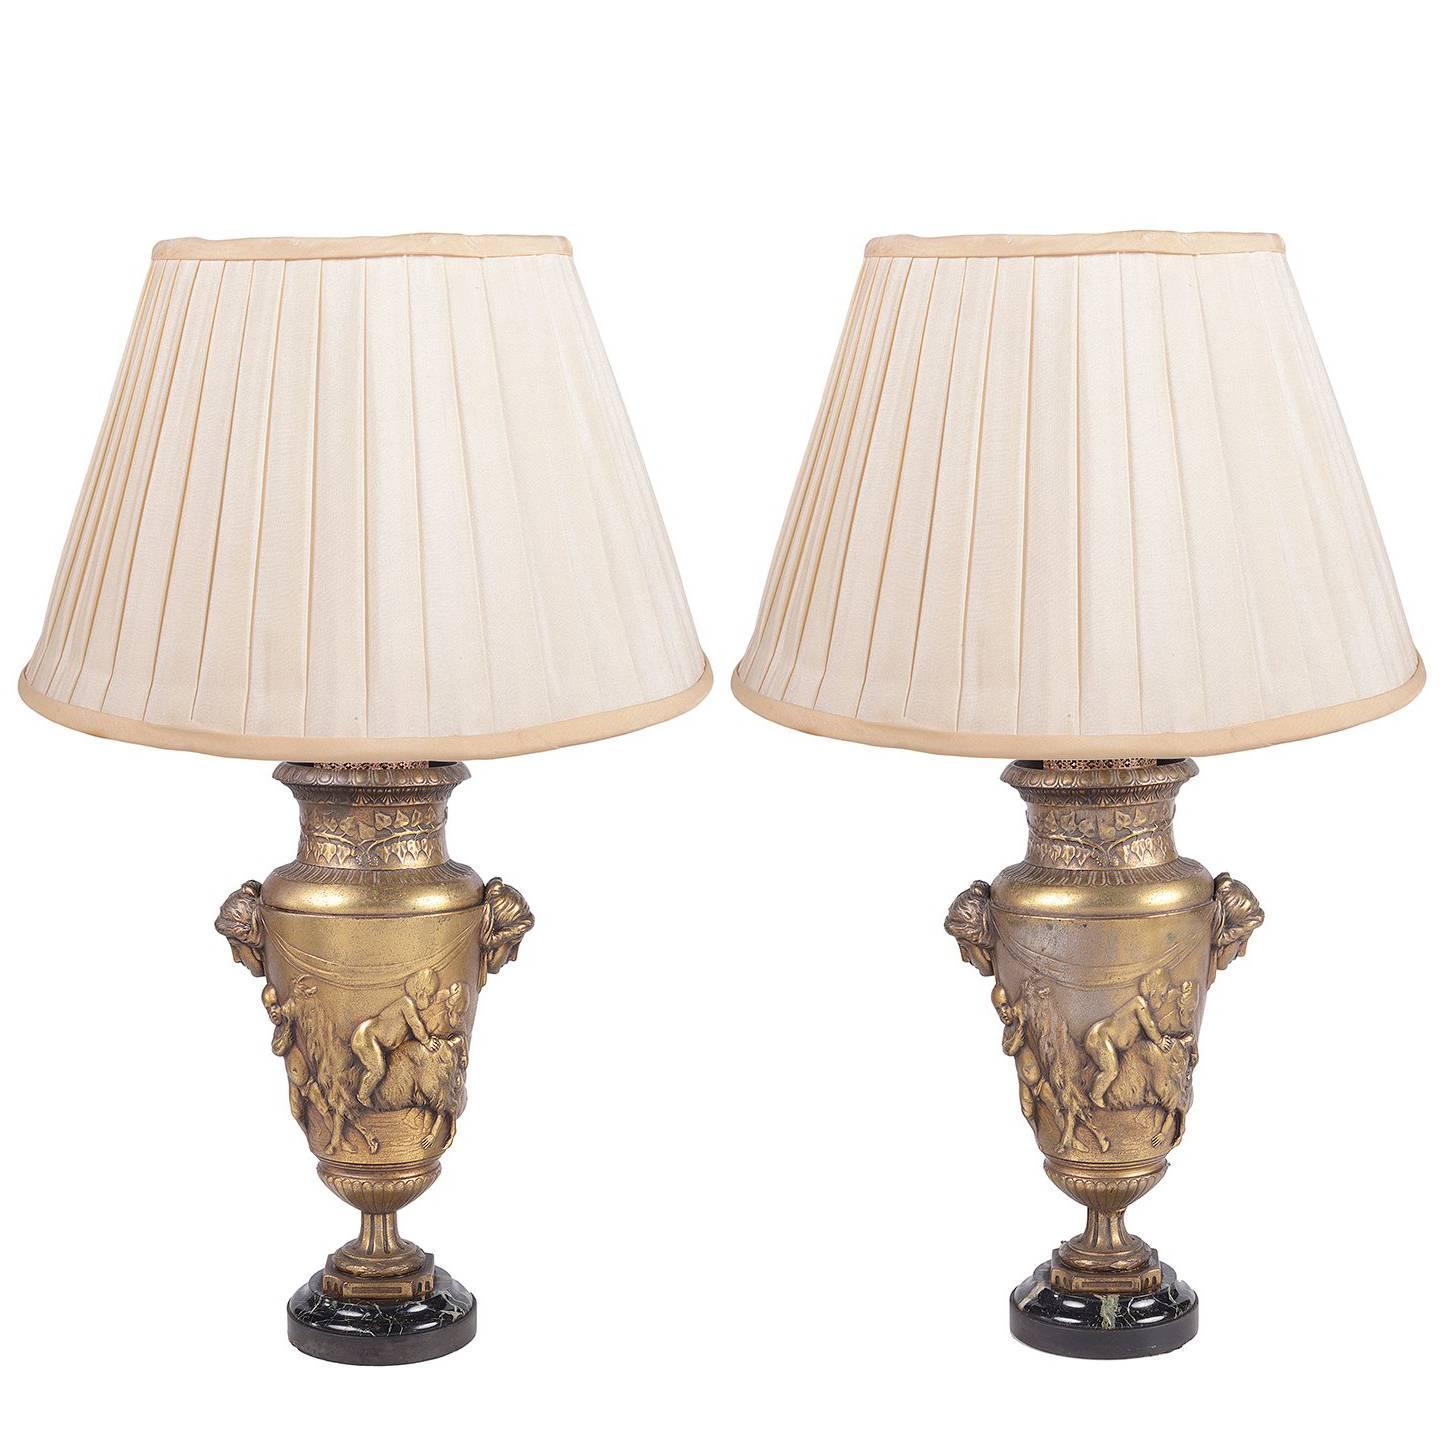 Pair of Classical 19th Century Bronze Lamps